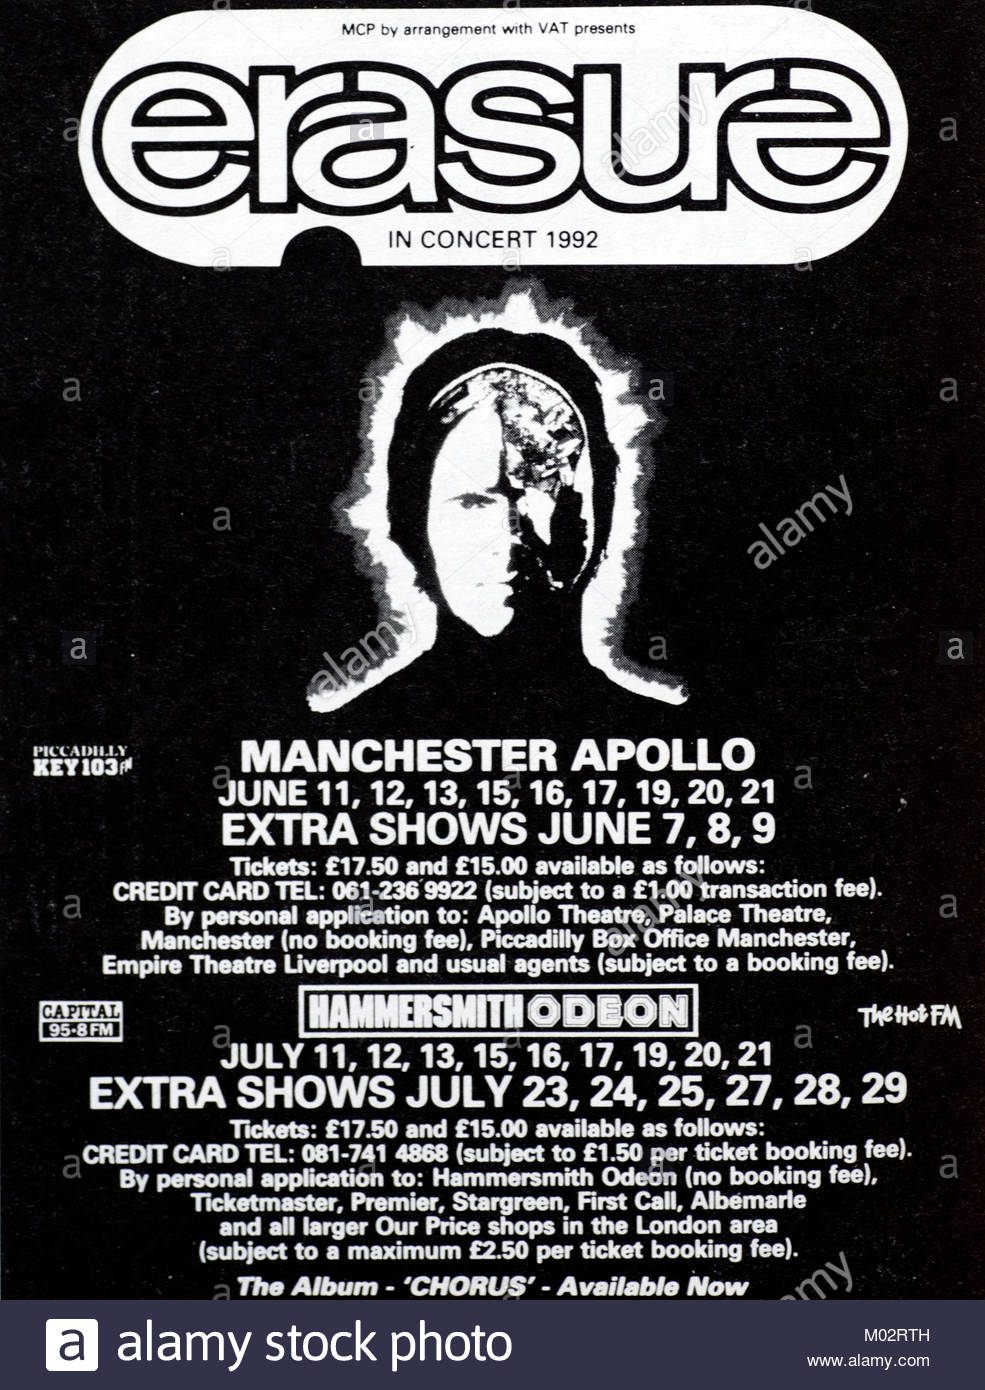 Magazine advert with UK tour dates for Erasure 1992 - Stock Image